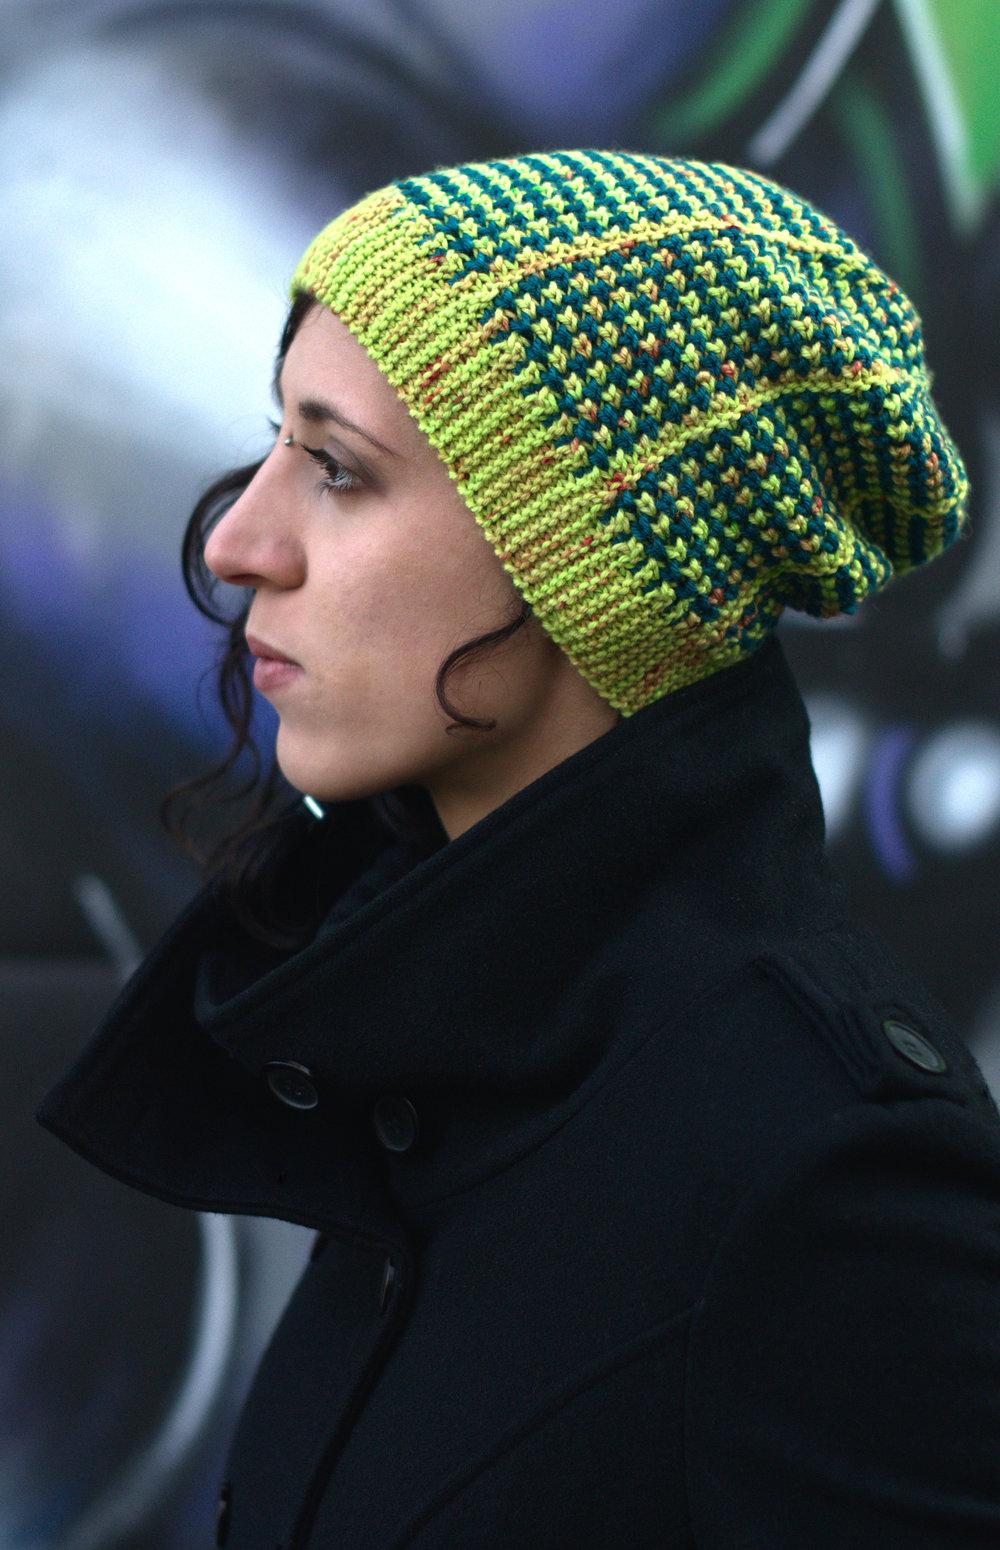 Kourserb sideways knit slouchy Hat hand knitting pattern for hand-dyed DK yarns